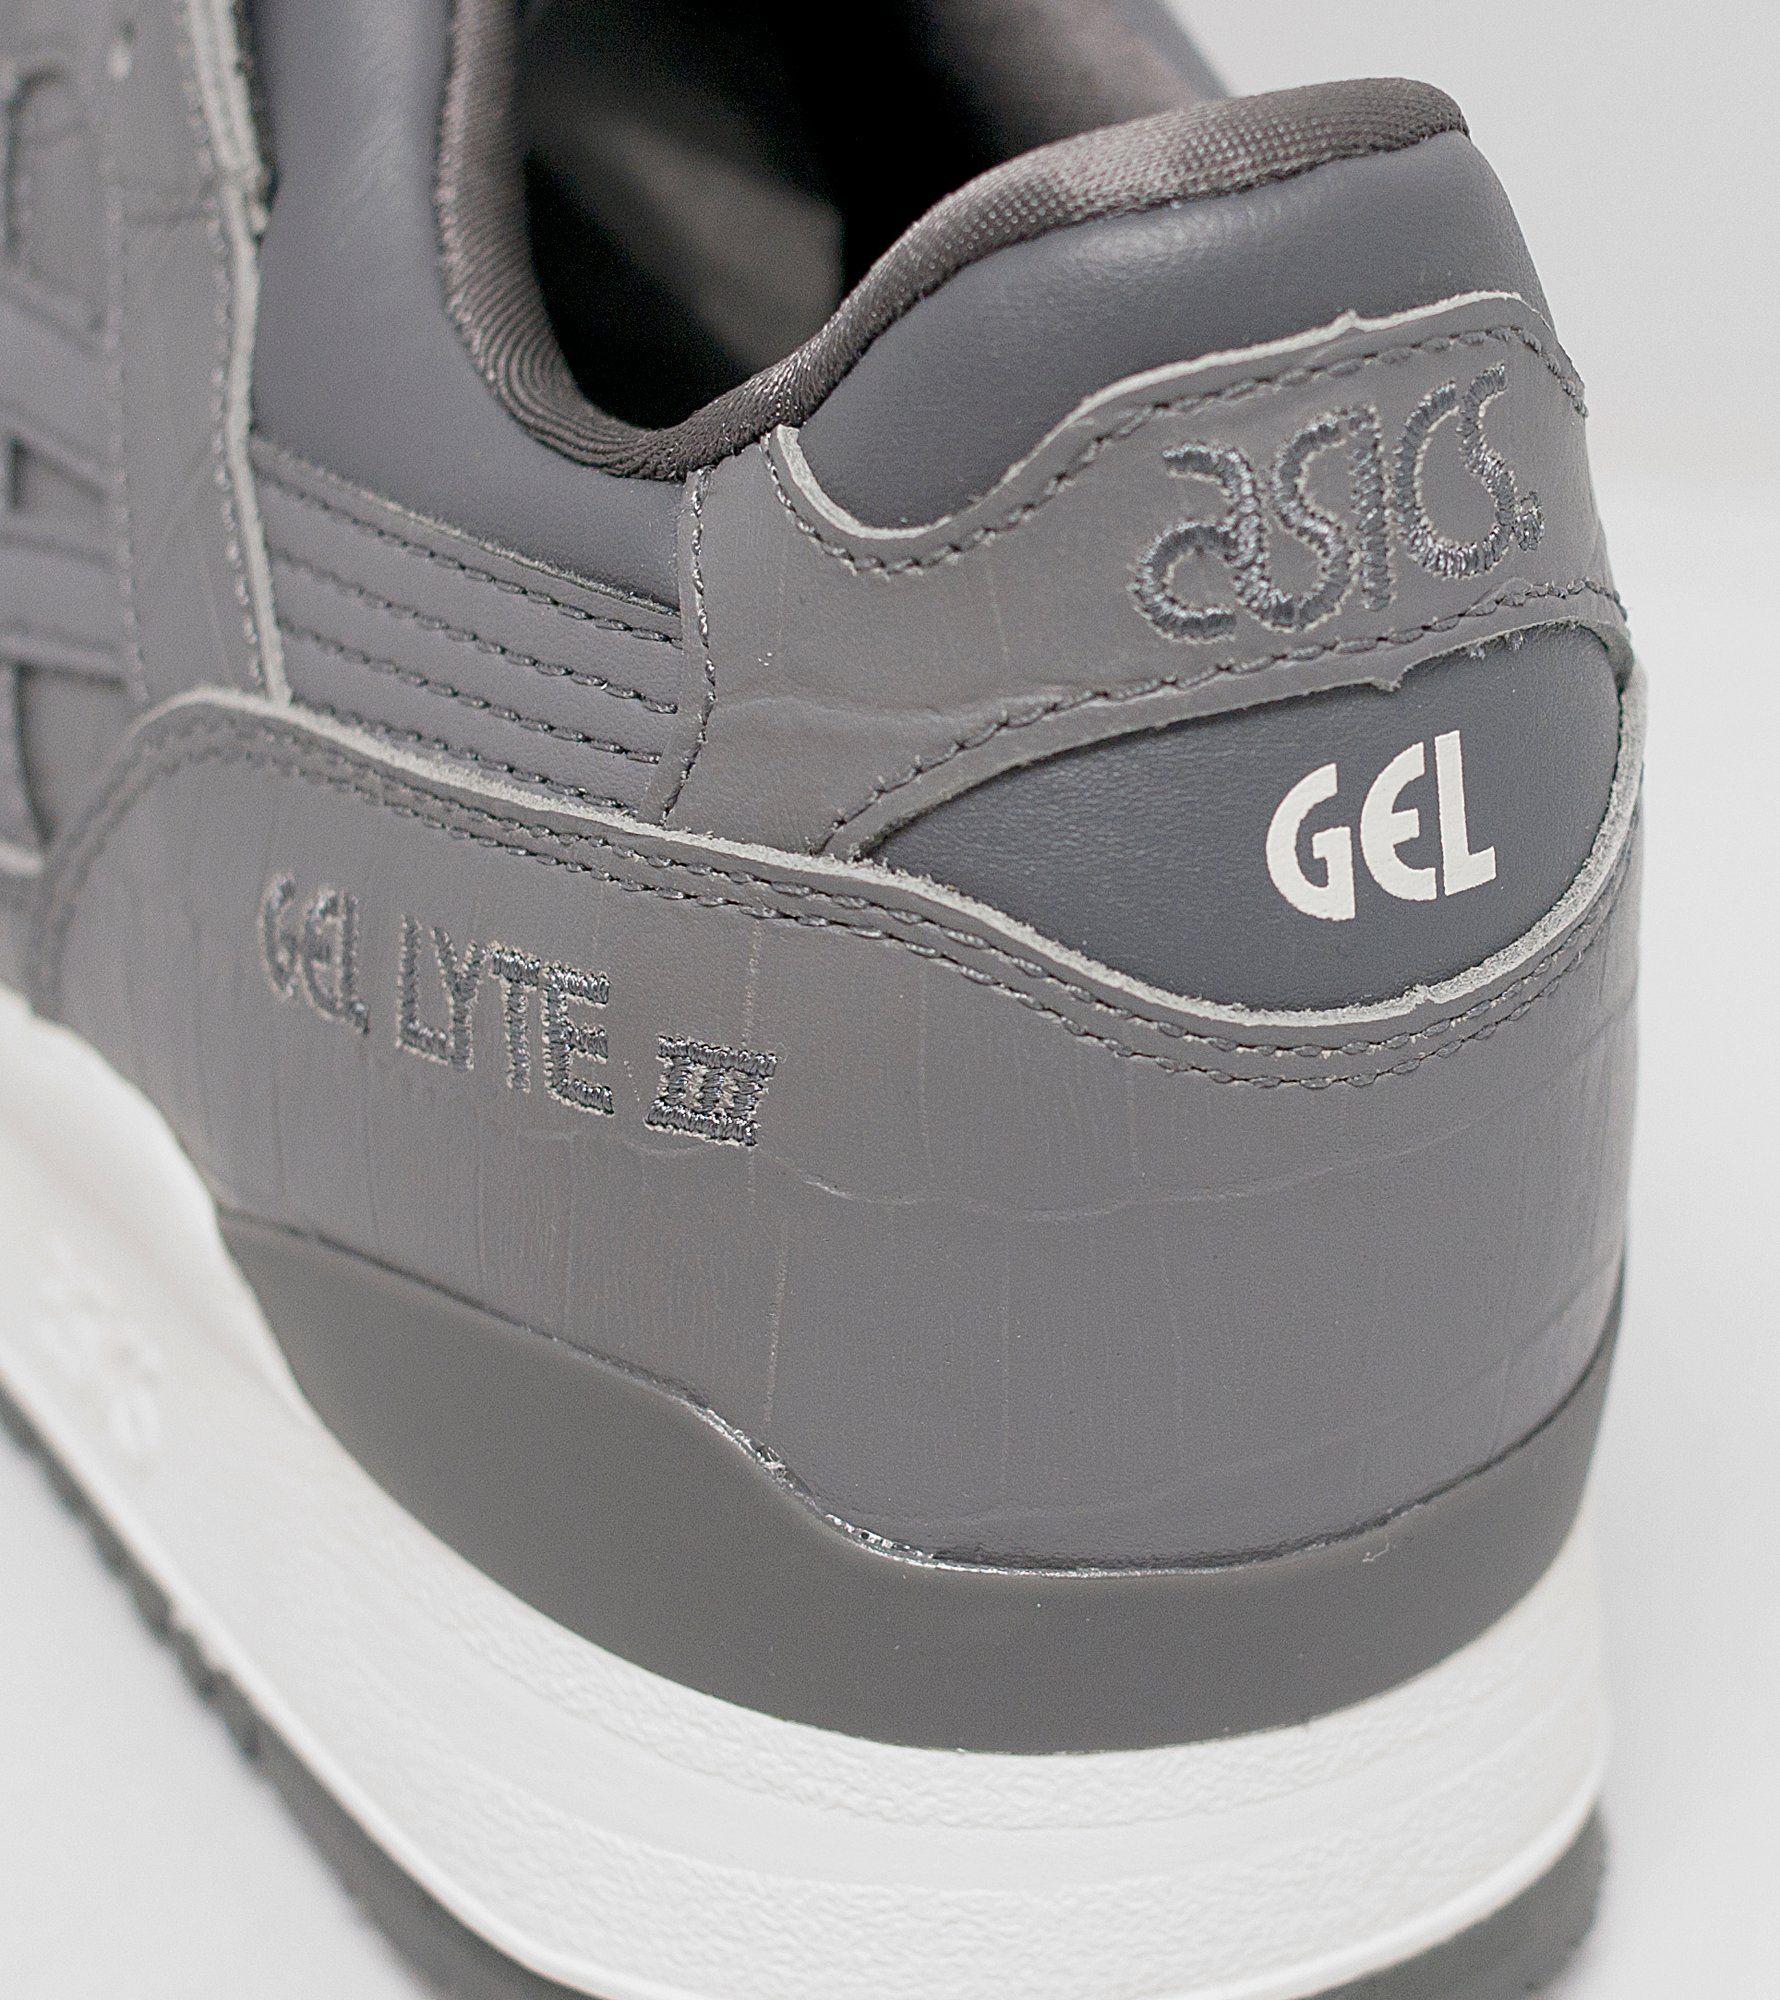 ASICS Gel Lyte III 'Croc'